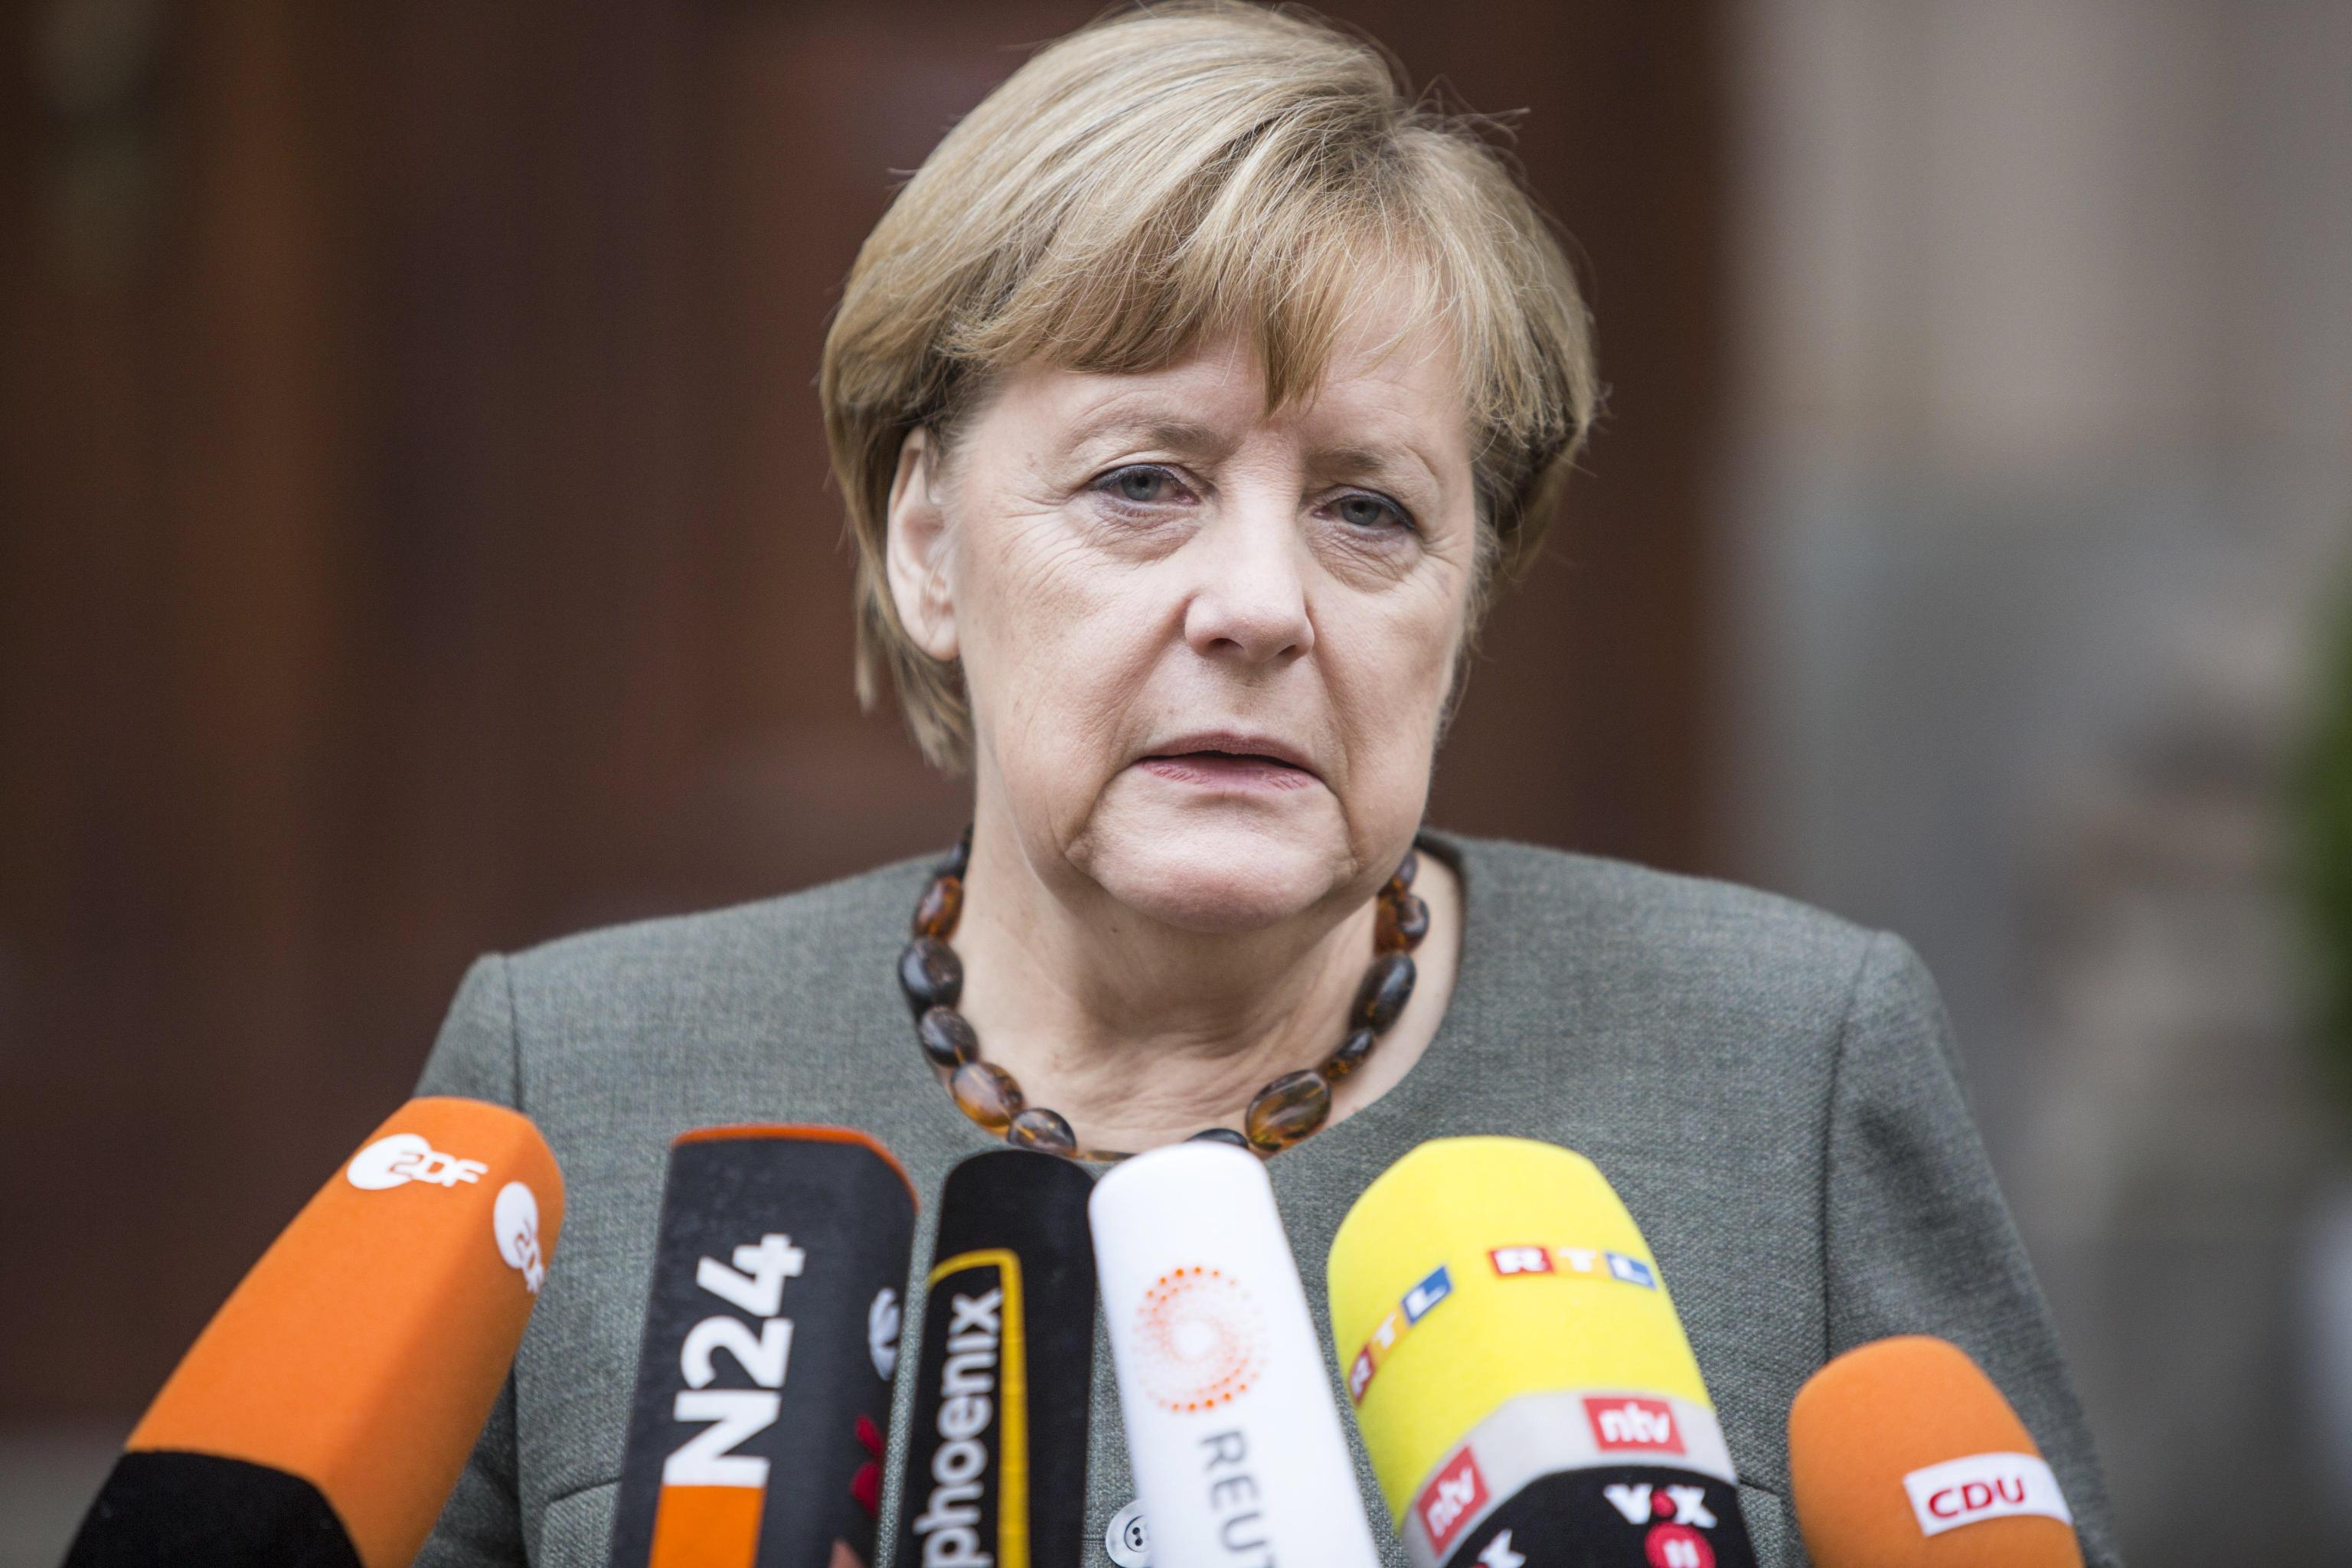 Germania: colloqui decisivi per governo